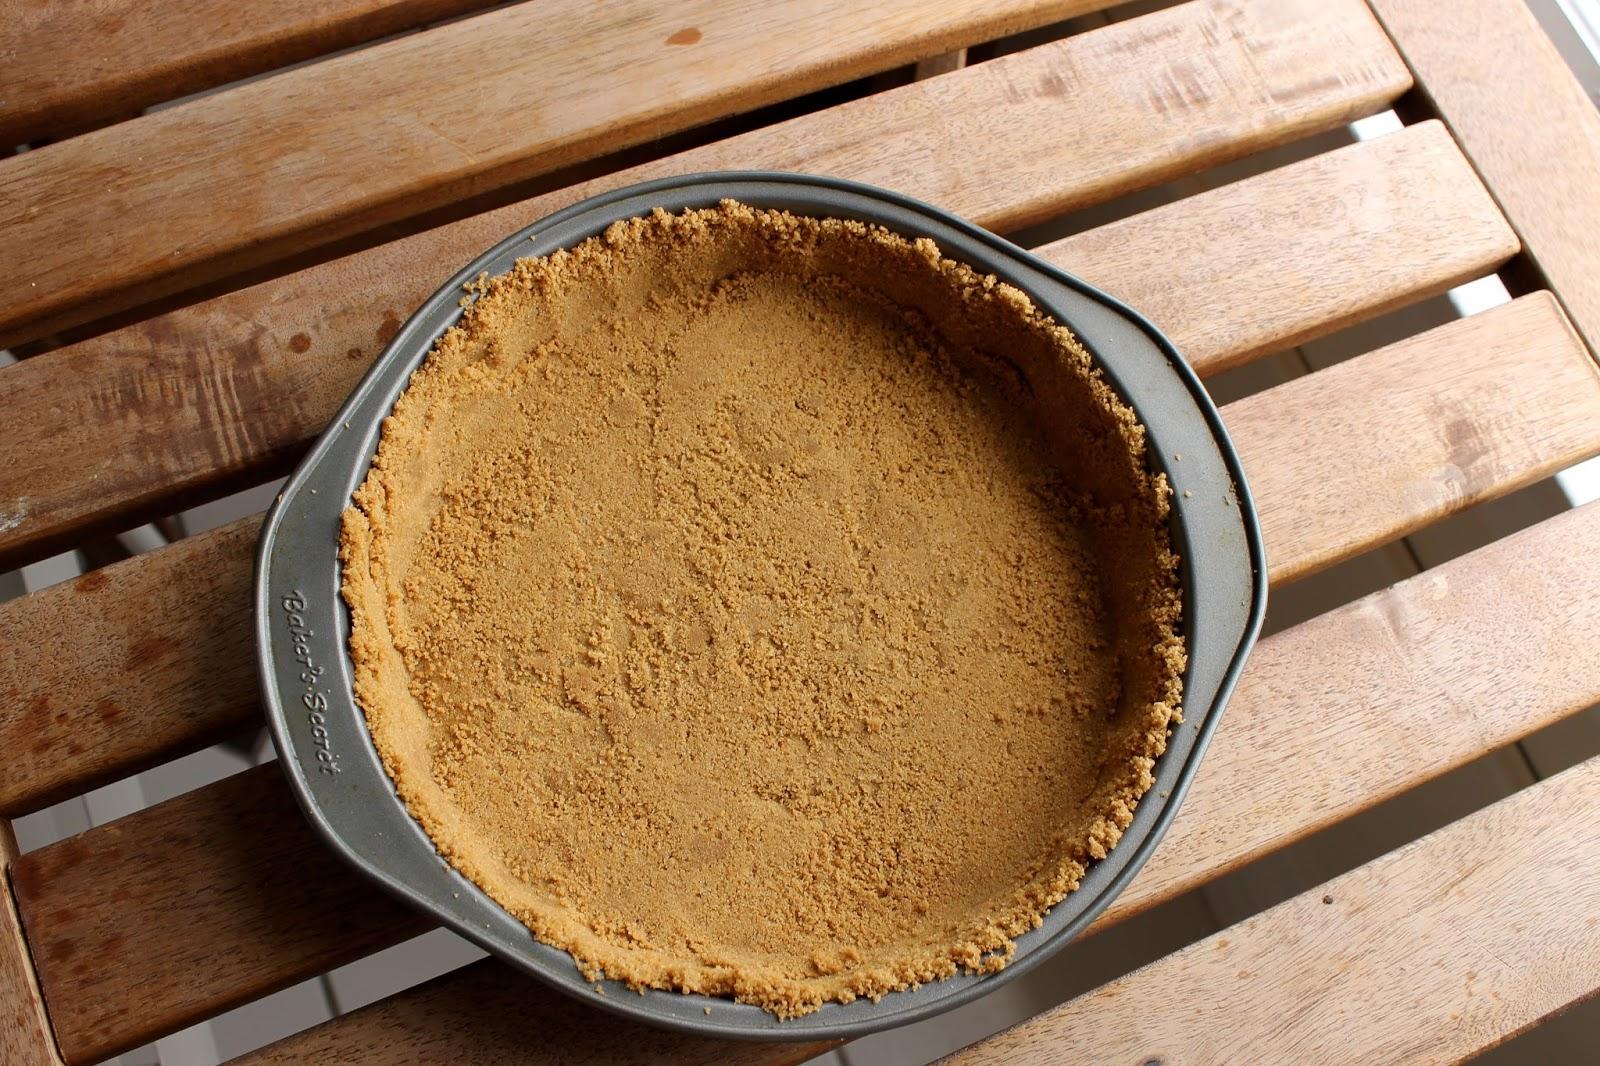 Ladyface blog lemon meringue pie for Lemon meringue pie with graham cracker crust